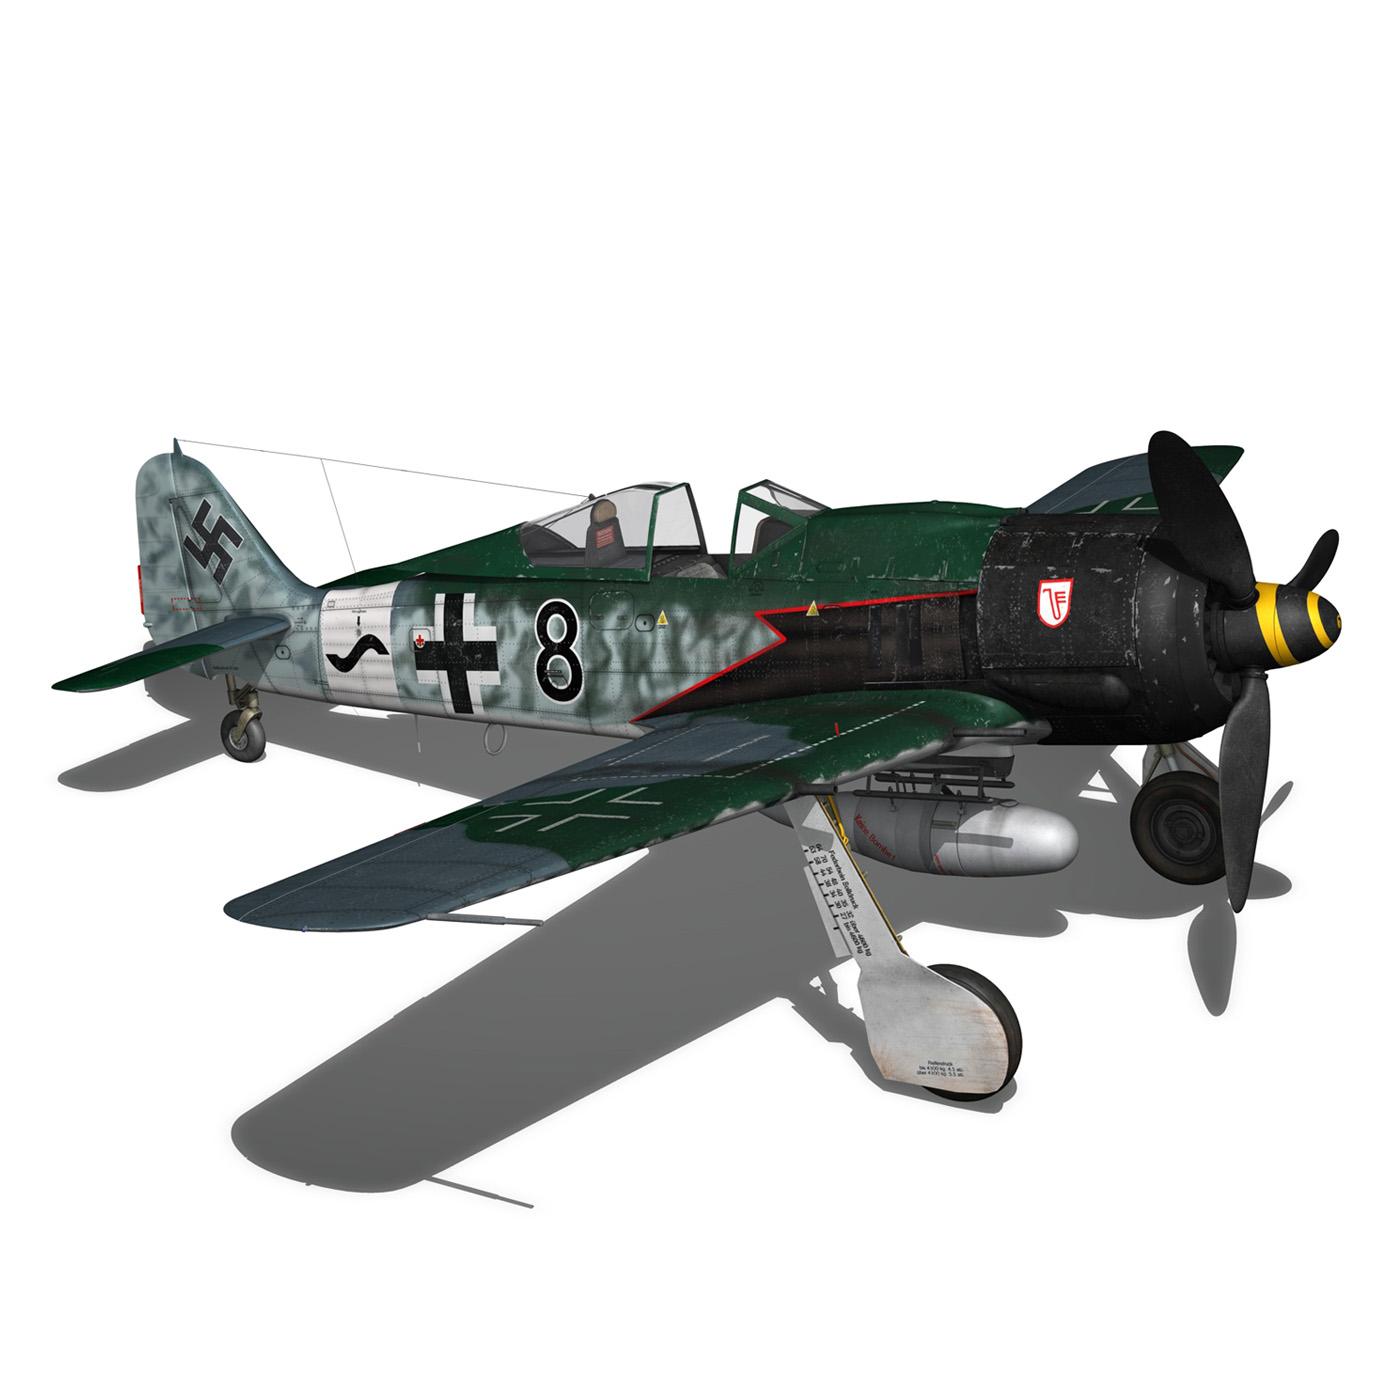 focke wulf – fw190 a8 – black 8 3d model 3ds c4d fbx lwo lw lws obj 266065